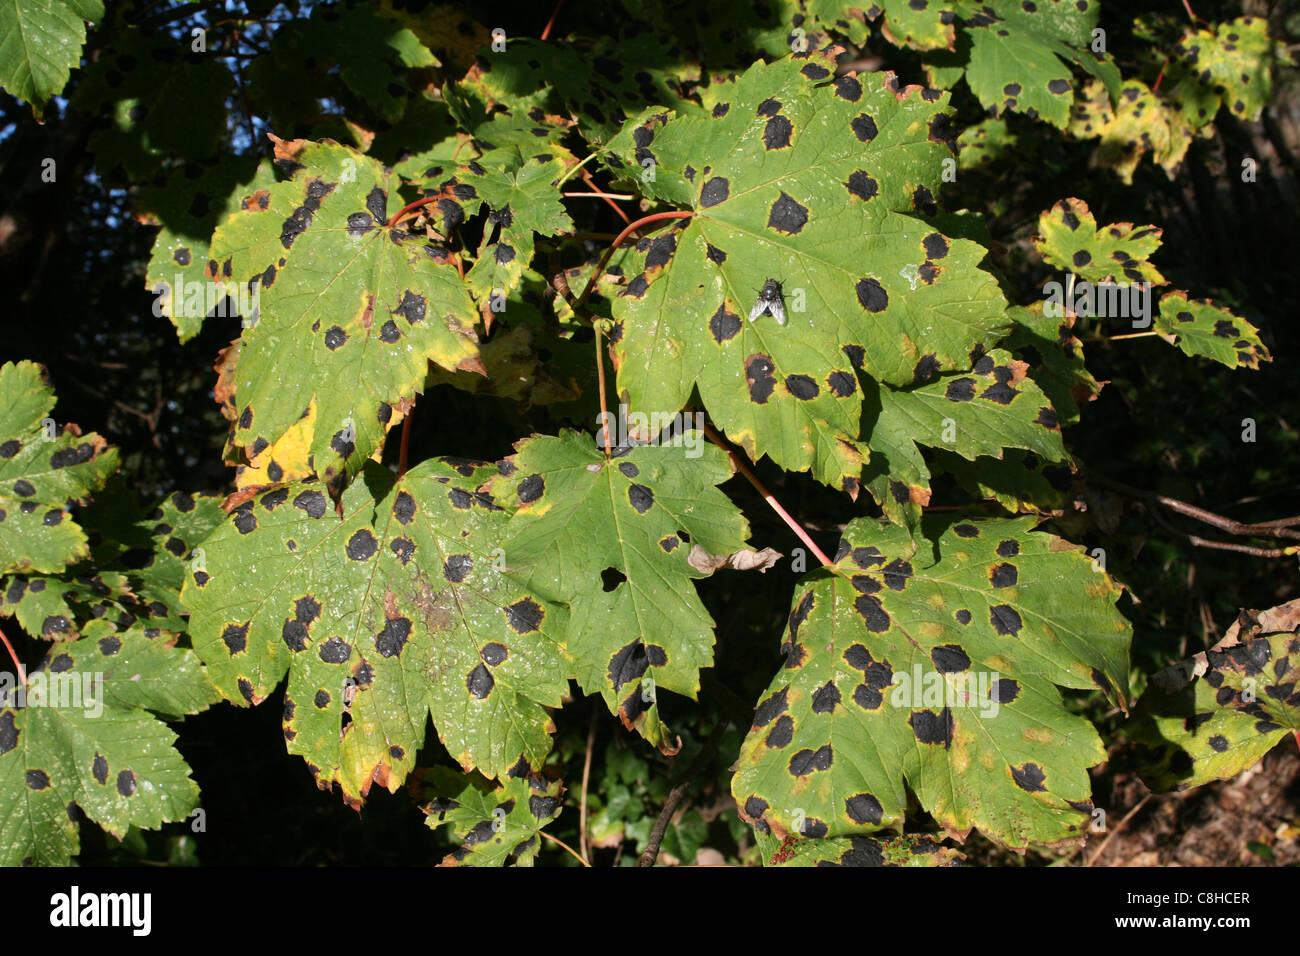 Tar Spot Fungus Rhytisma acerinum On Sycamore Leaves - Stock Image